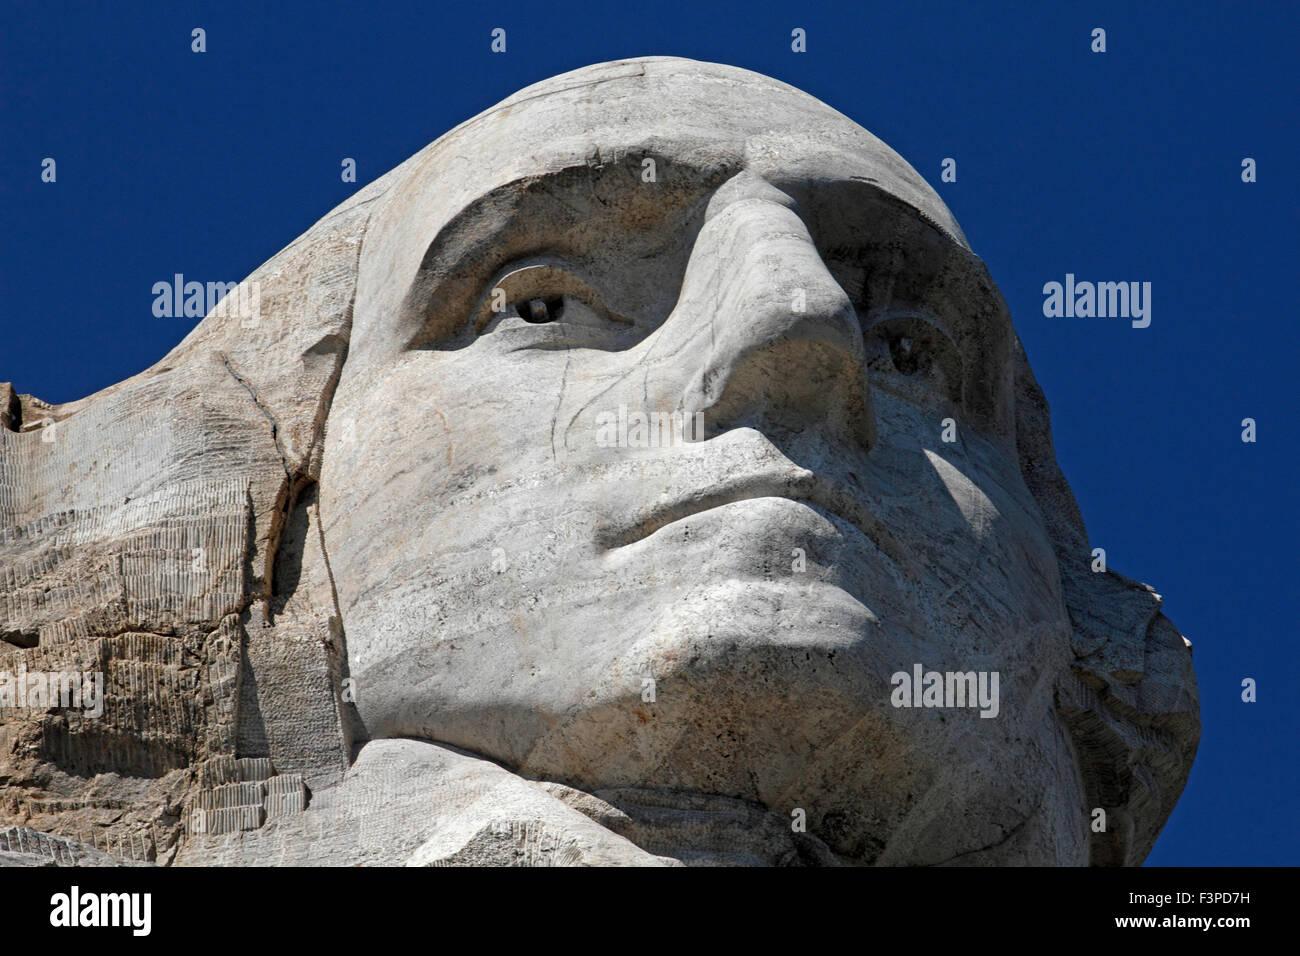 Closeup of George Washington on Mount Rushmore - Stock Image